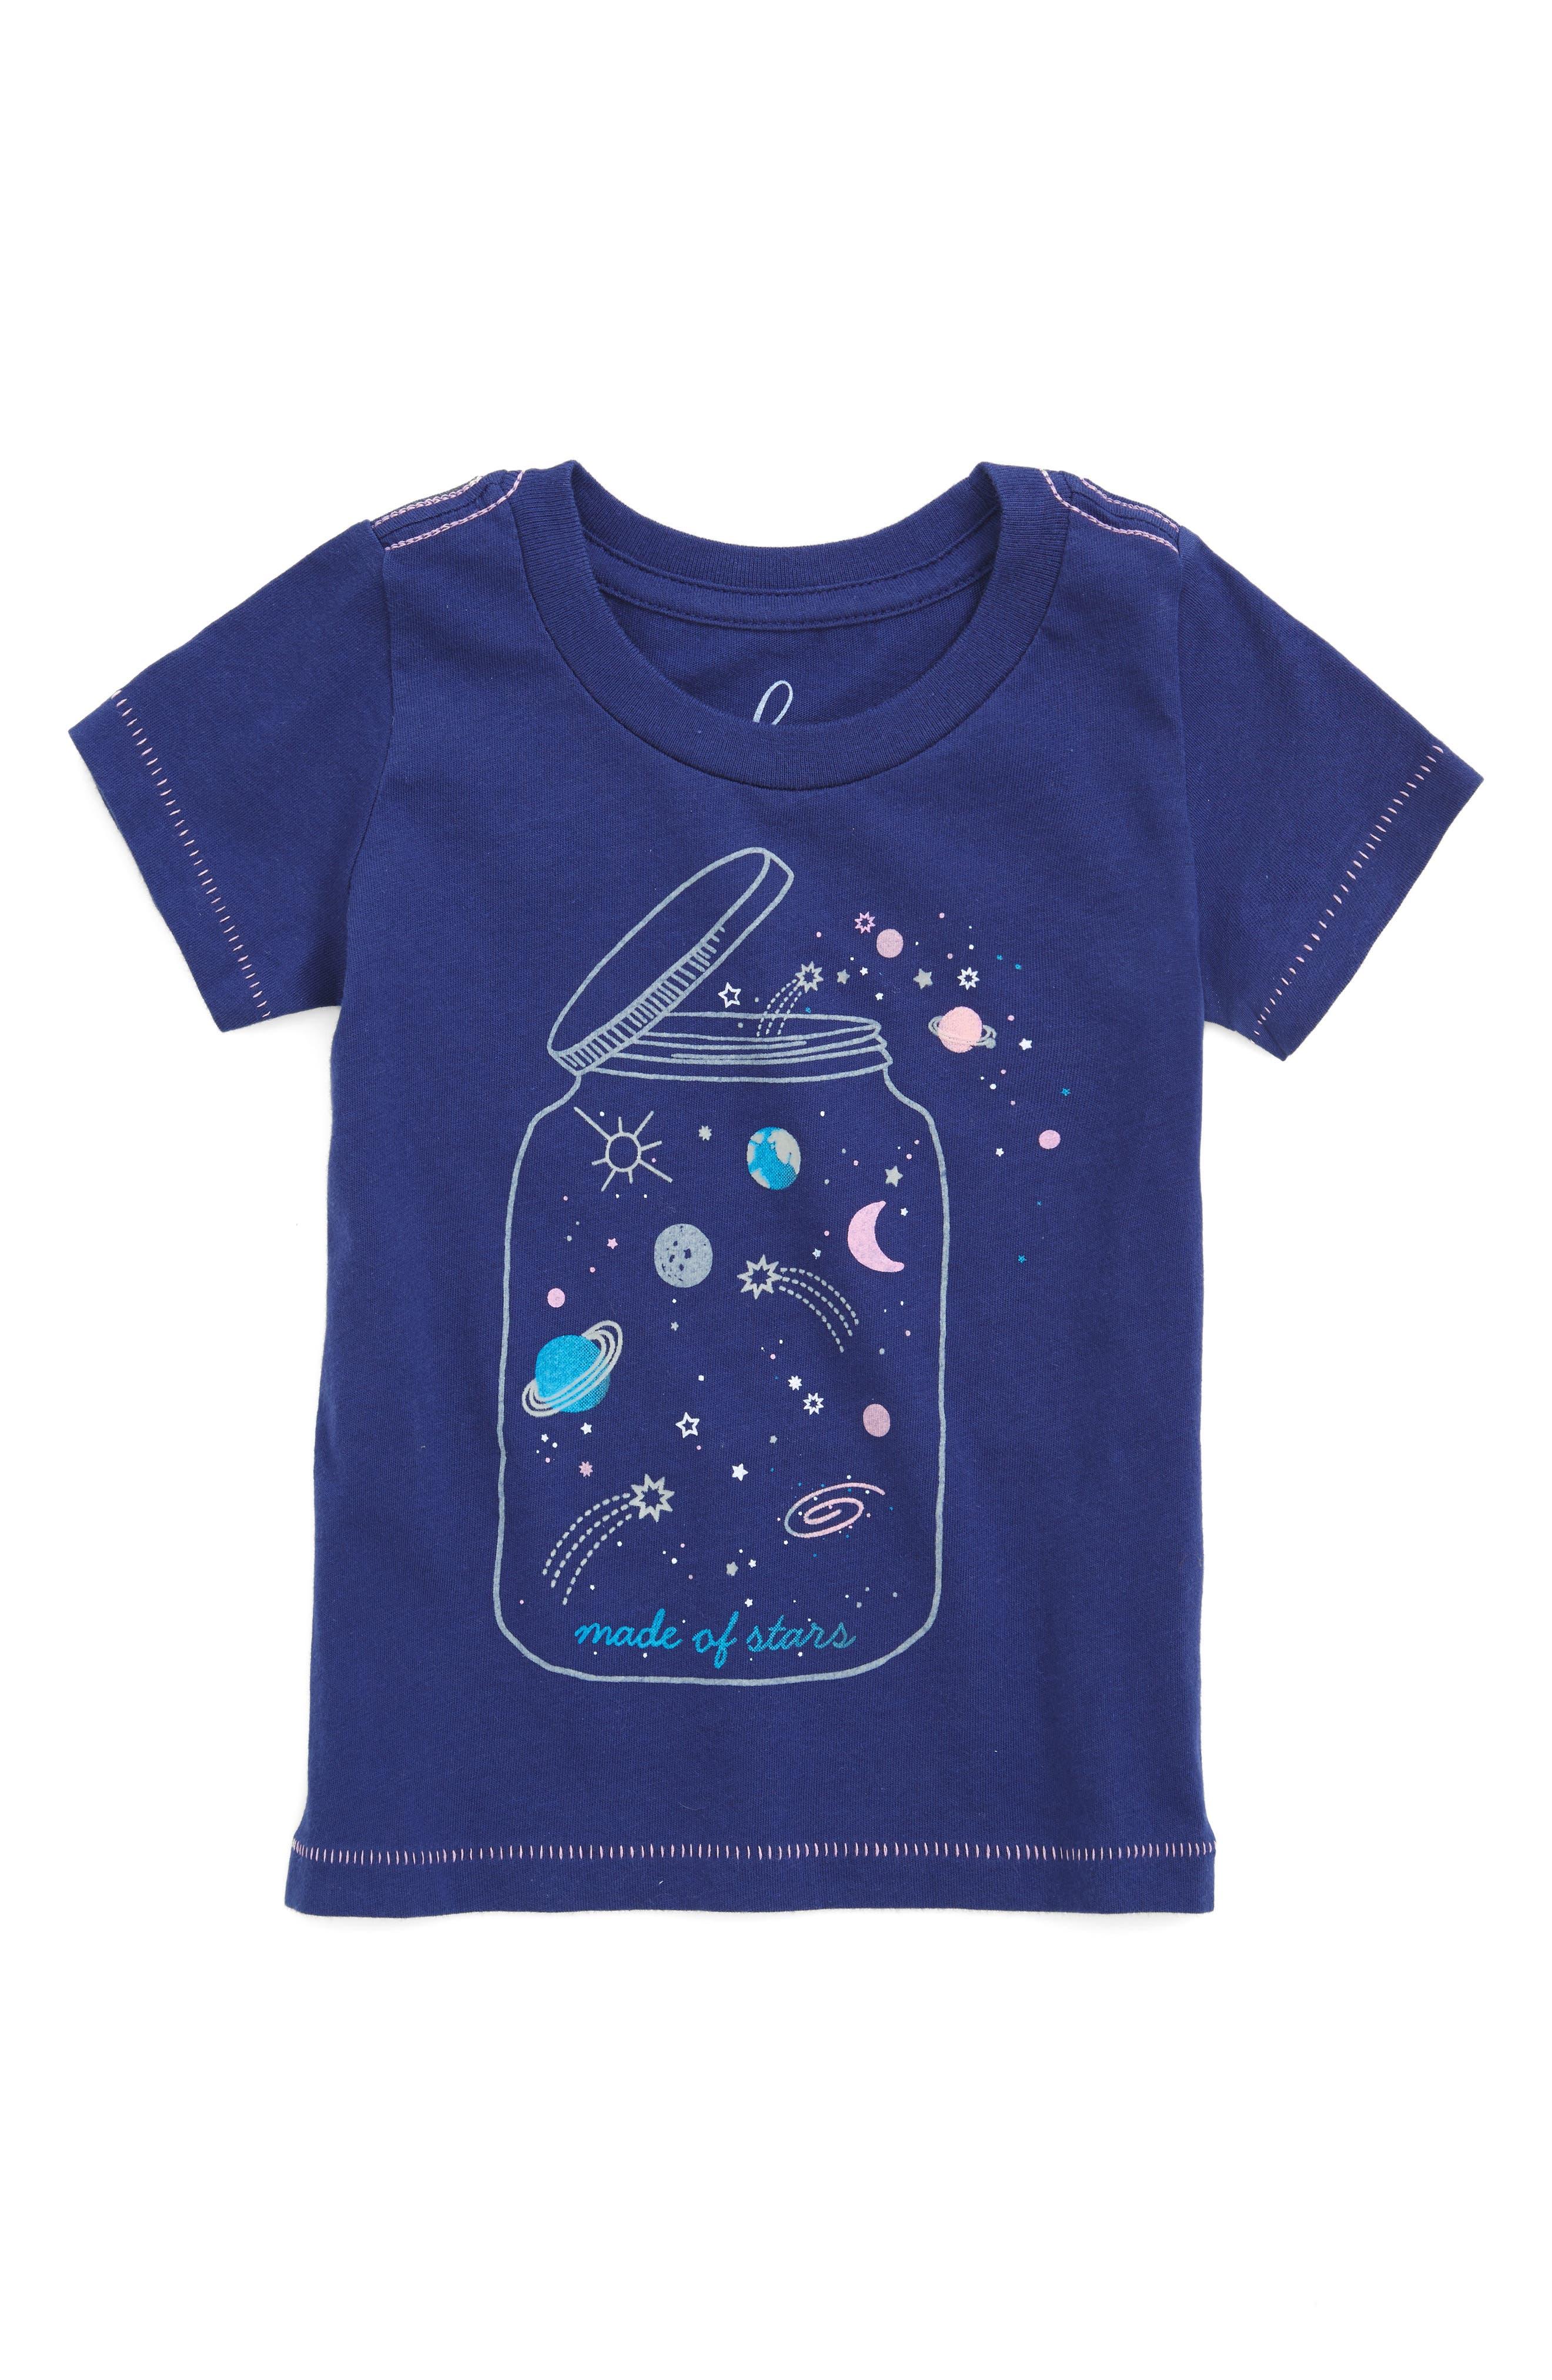 Jar of Stars Graphic Tee,                             Main thumbnail 1, color,                             410